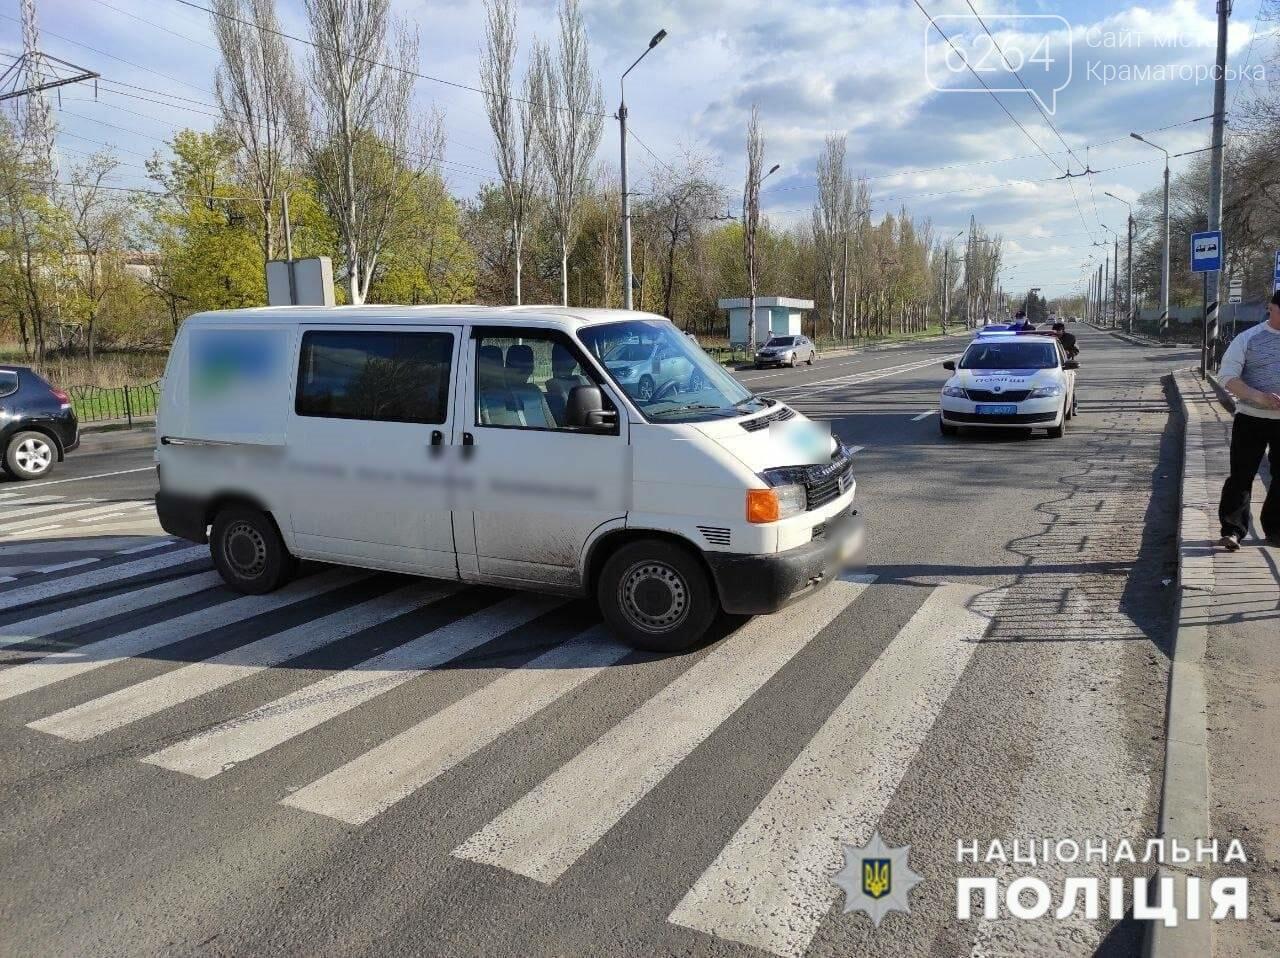 В Краматорске 56-летняя женщина попала под колеса микроавтобуса, фото-1